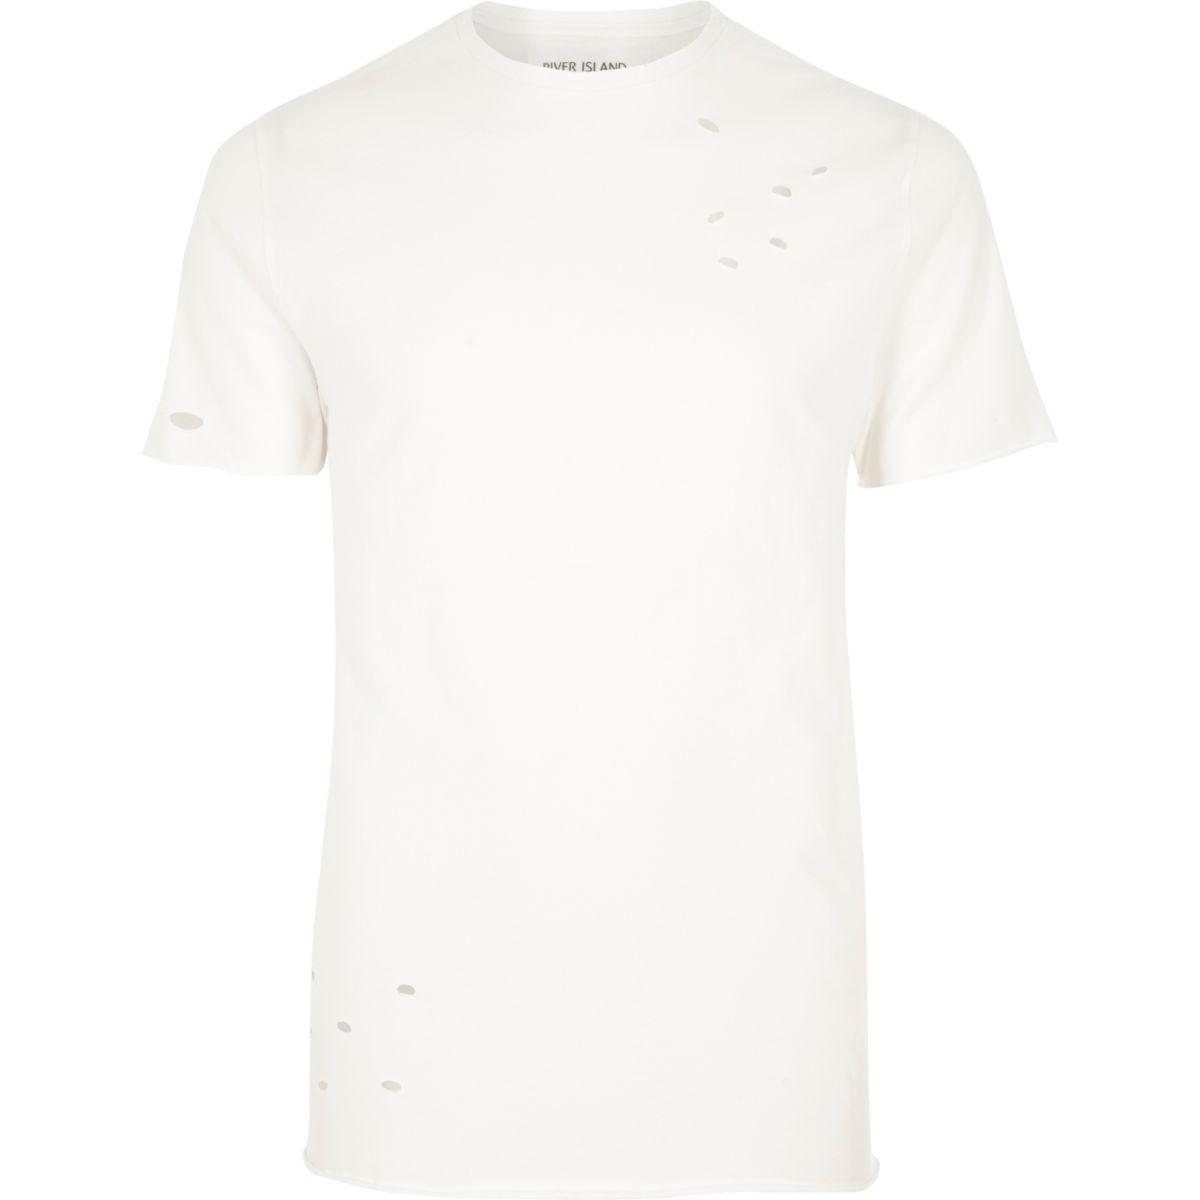 Cream distressed slim fit T-shirt